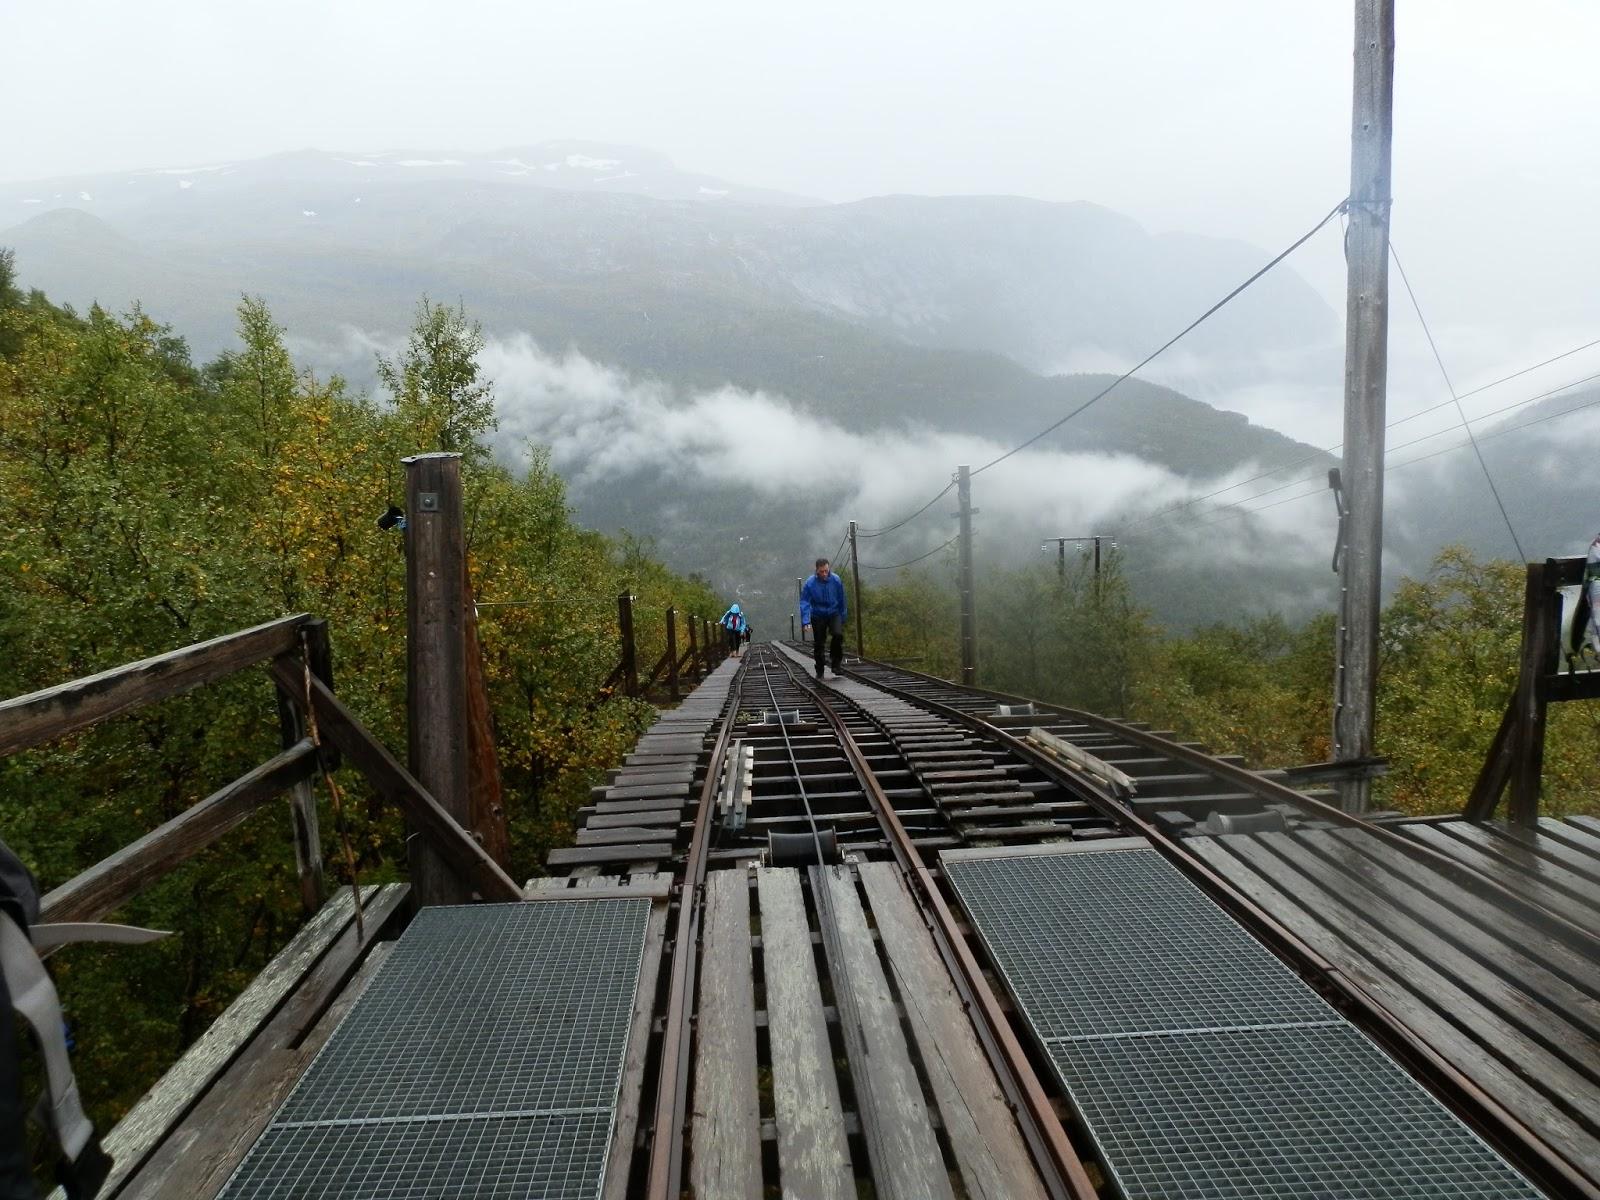 Refaire Escalier Trop Raide norway of life: trolltunga: we did it !!